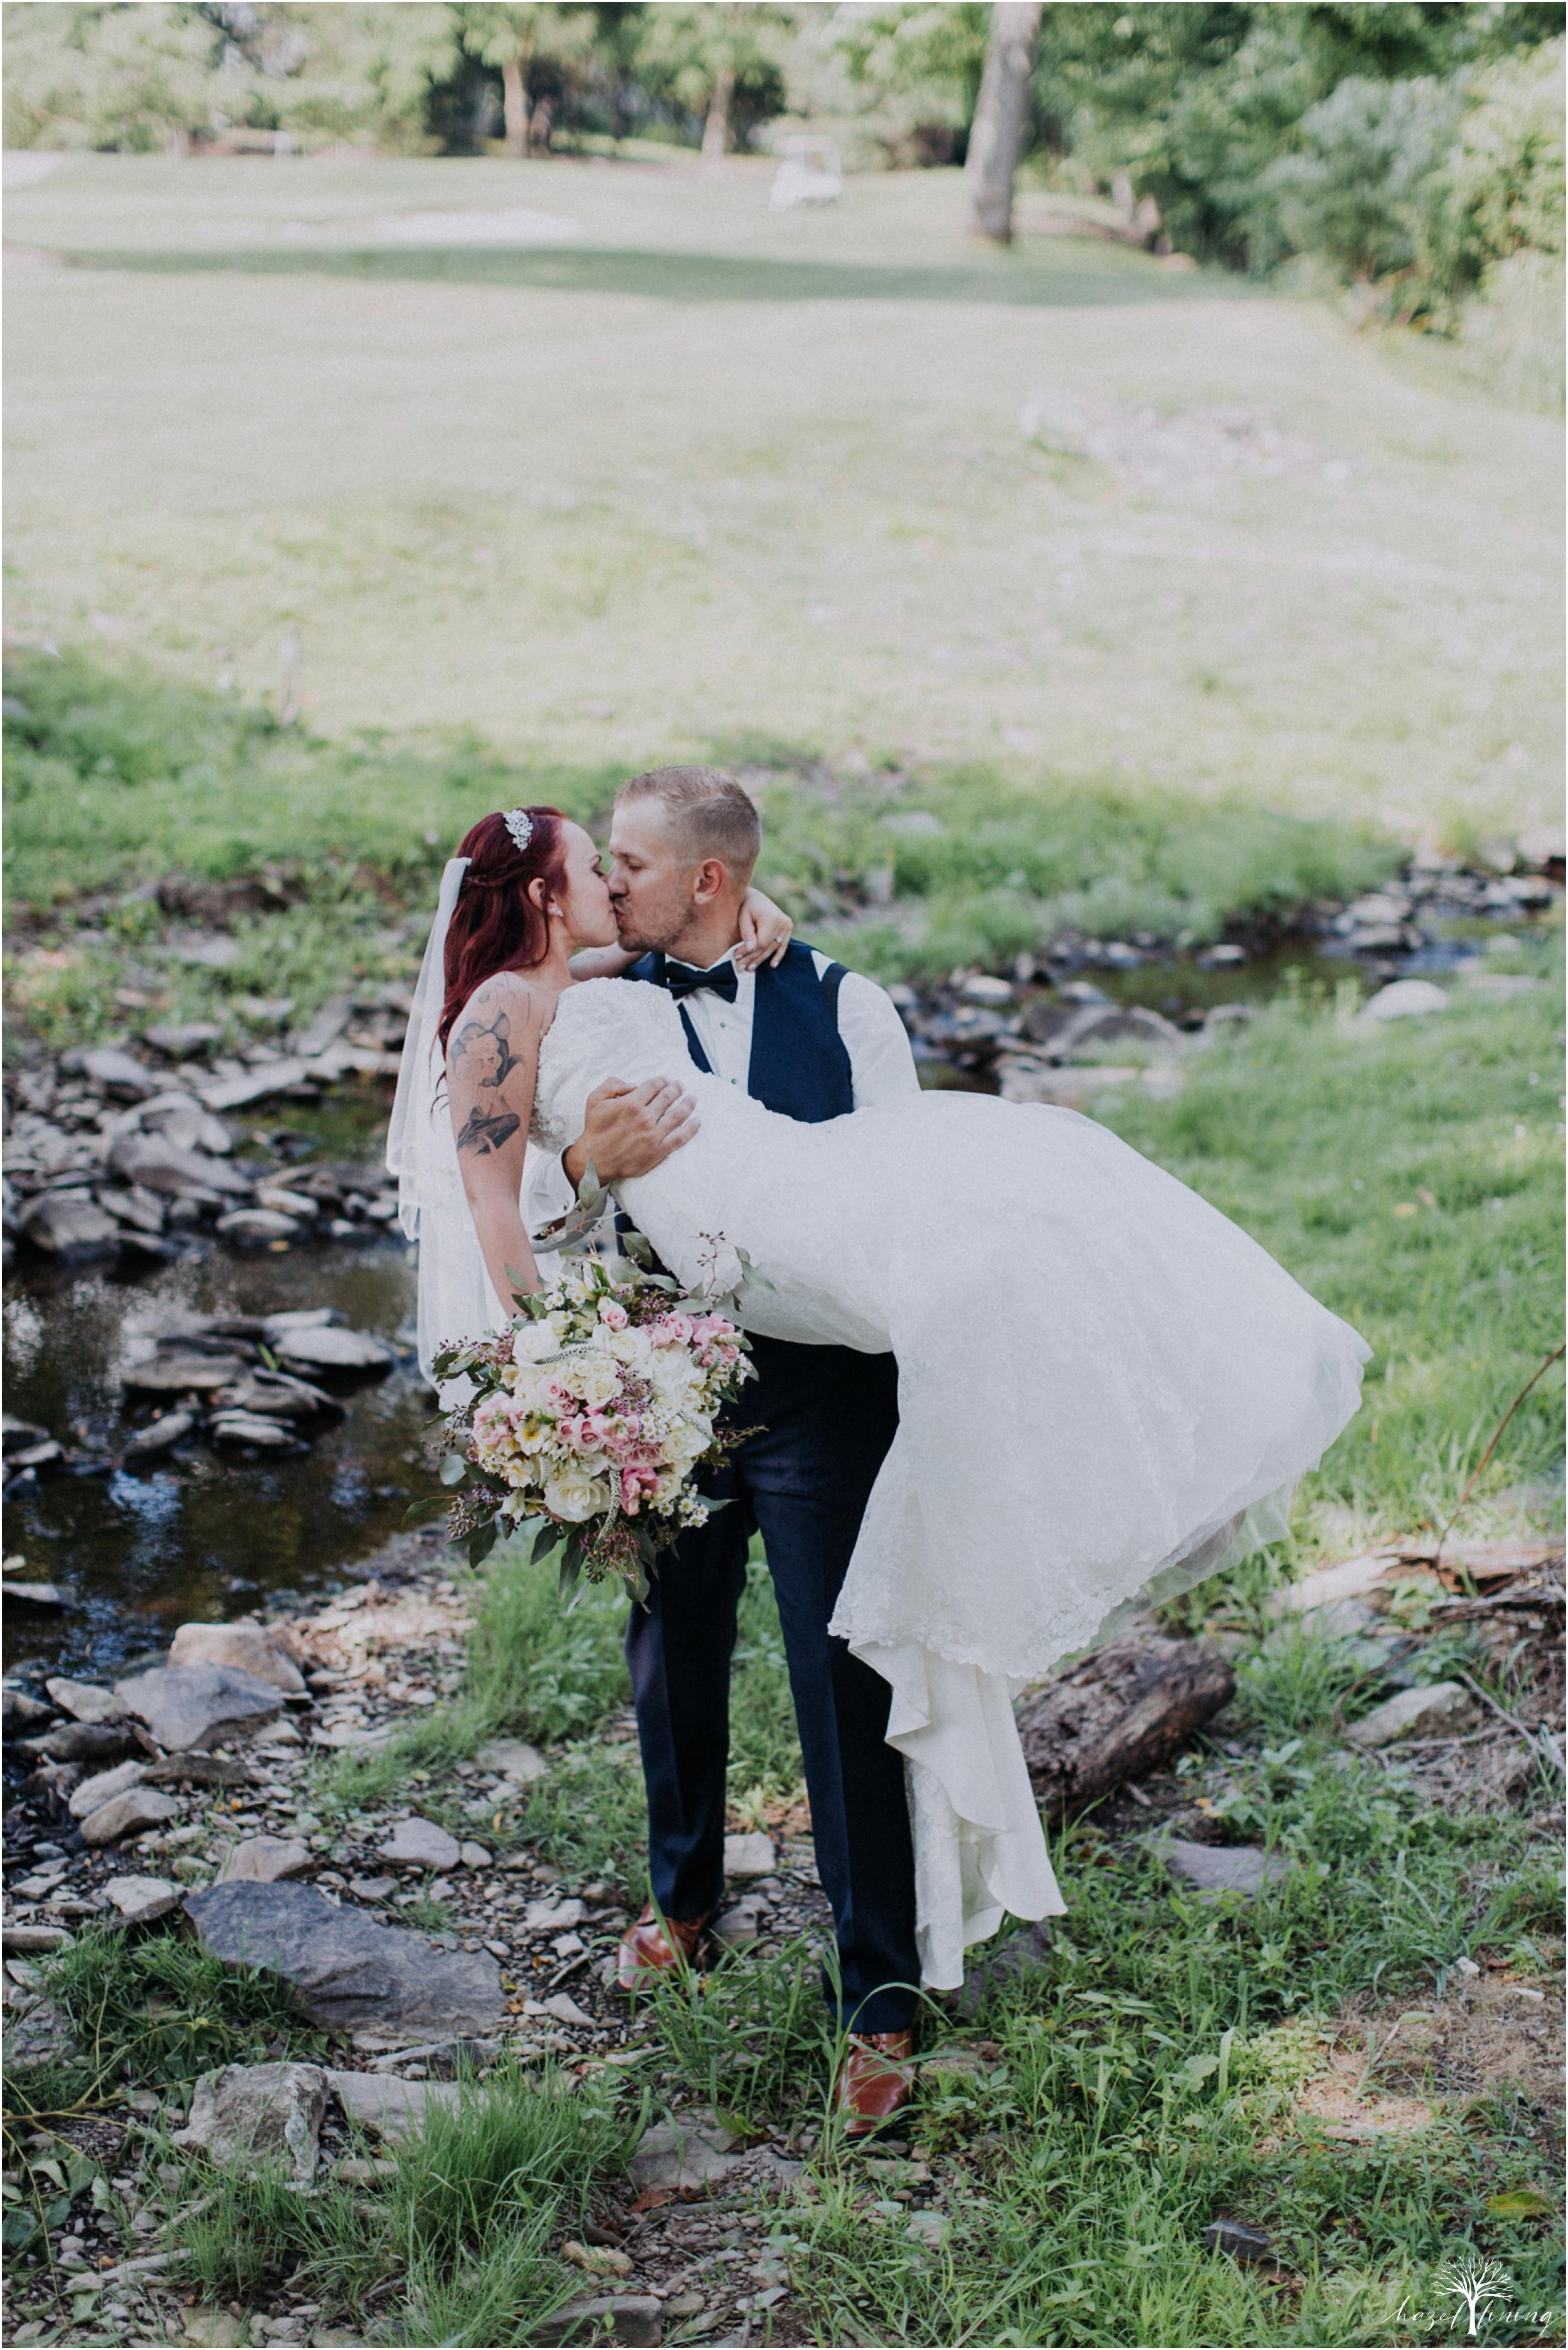 alyssa-james-stiteler-wedding-loft-and-sweet-water-cc-pennsburg-pennsylvania-hazel-lining-travel-wedding-elopement-photography_0094.jpg